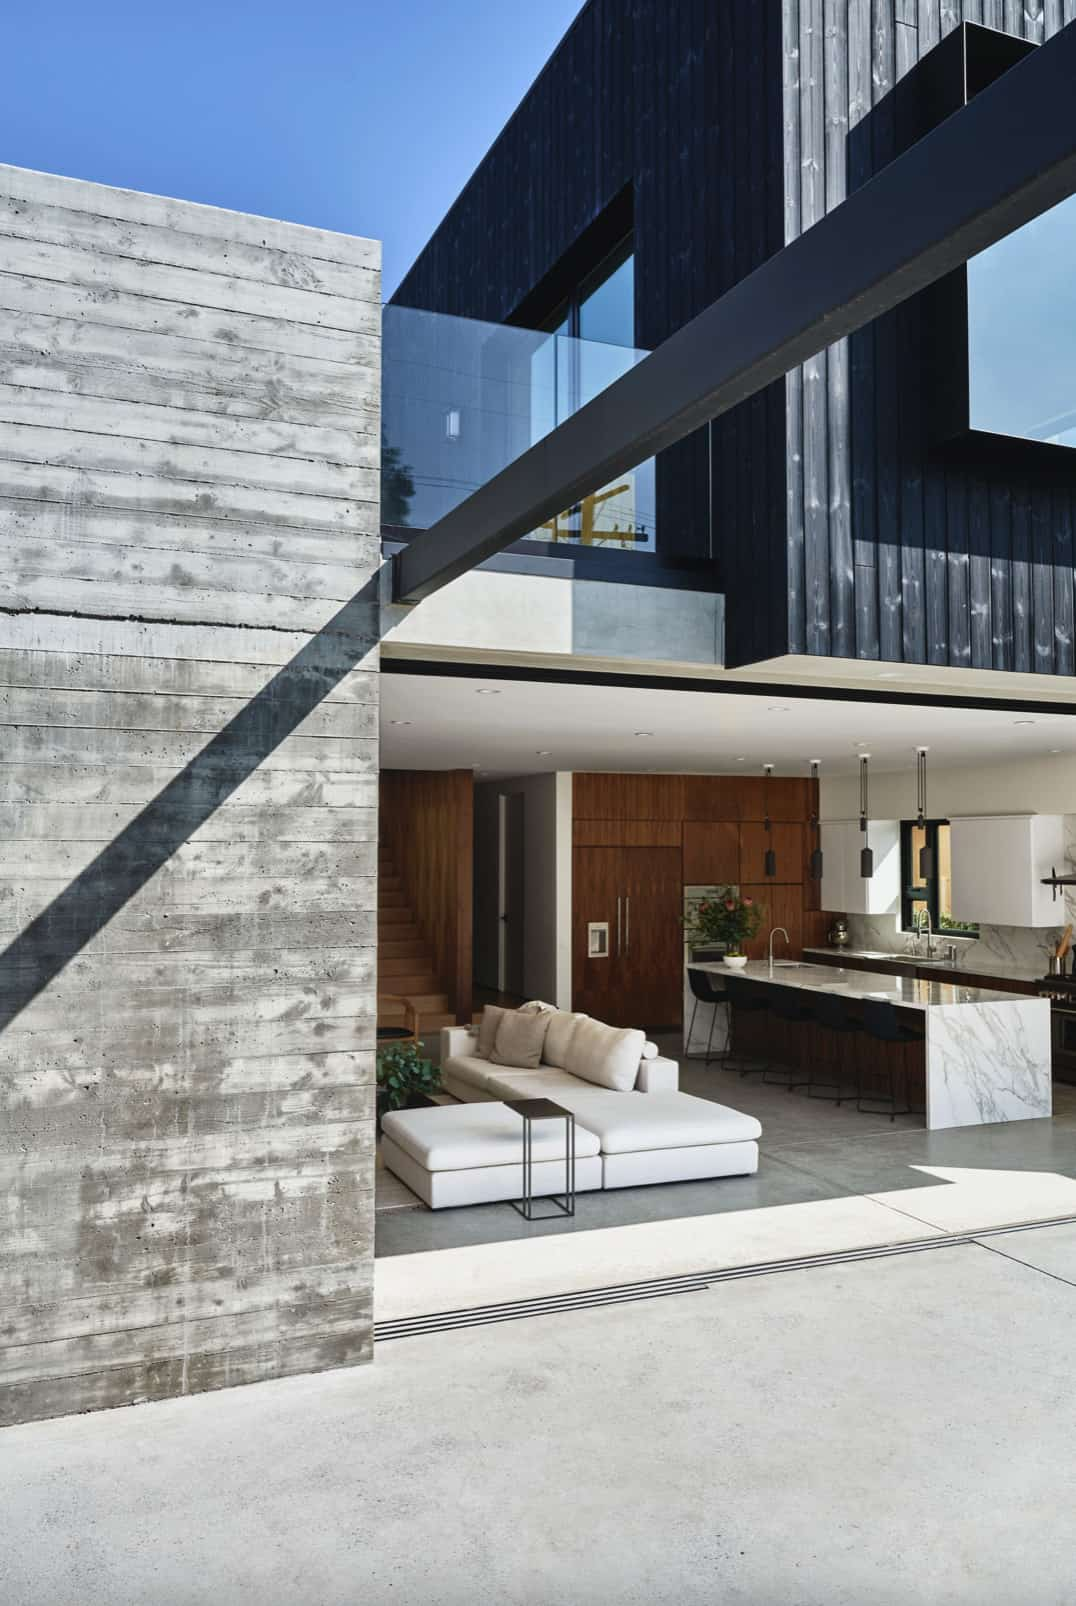 suvremeni-dom-vanjski-dvorište-dvorište